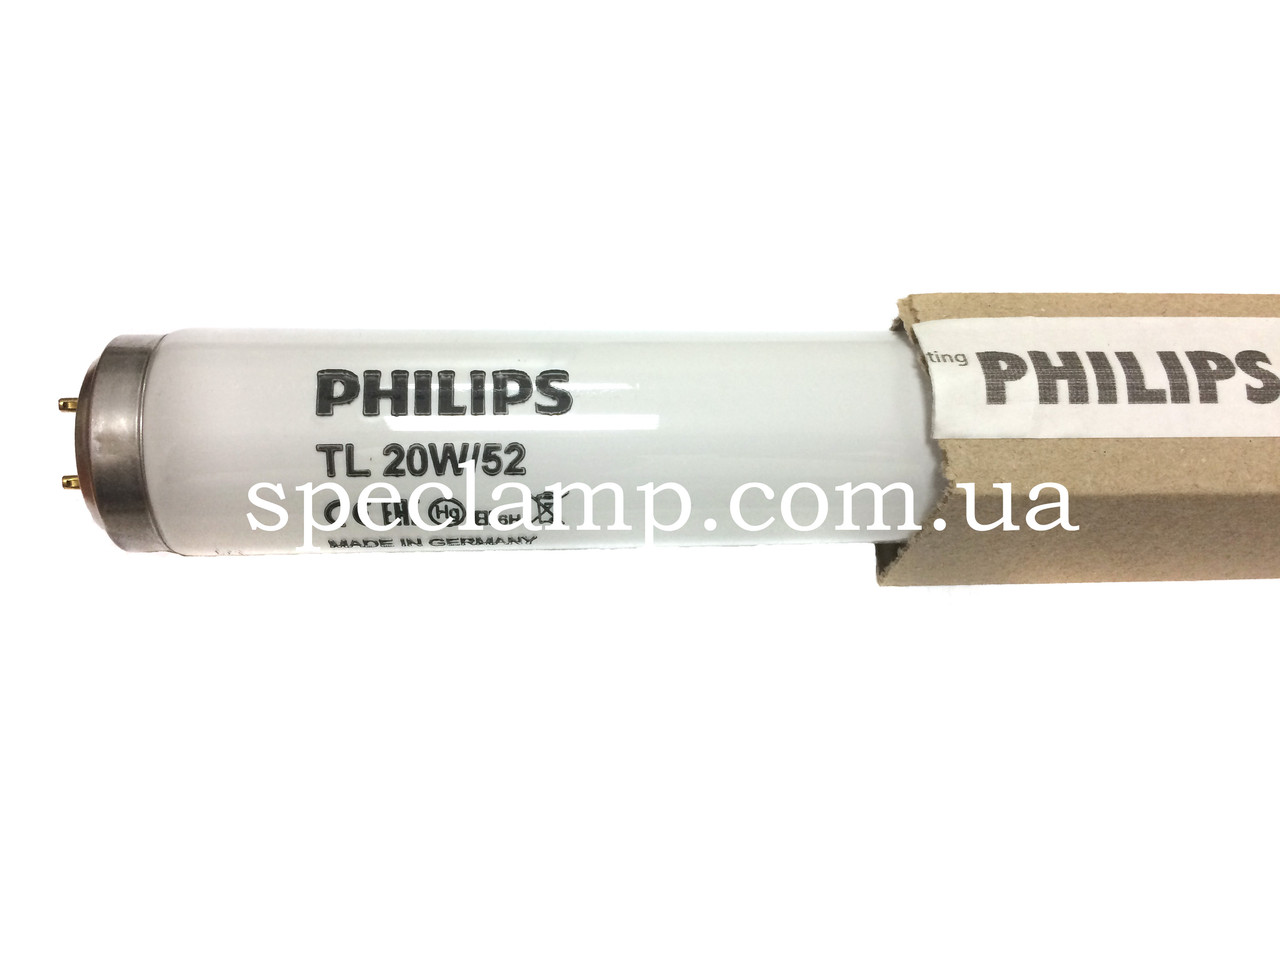 Лампа для лечения желтухи PHILIPS TL 20W/52 G13